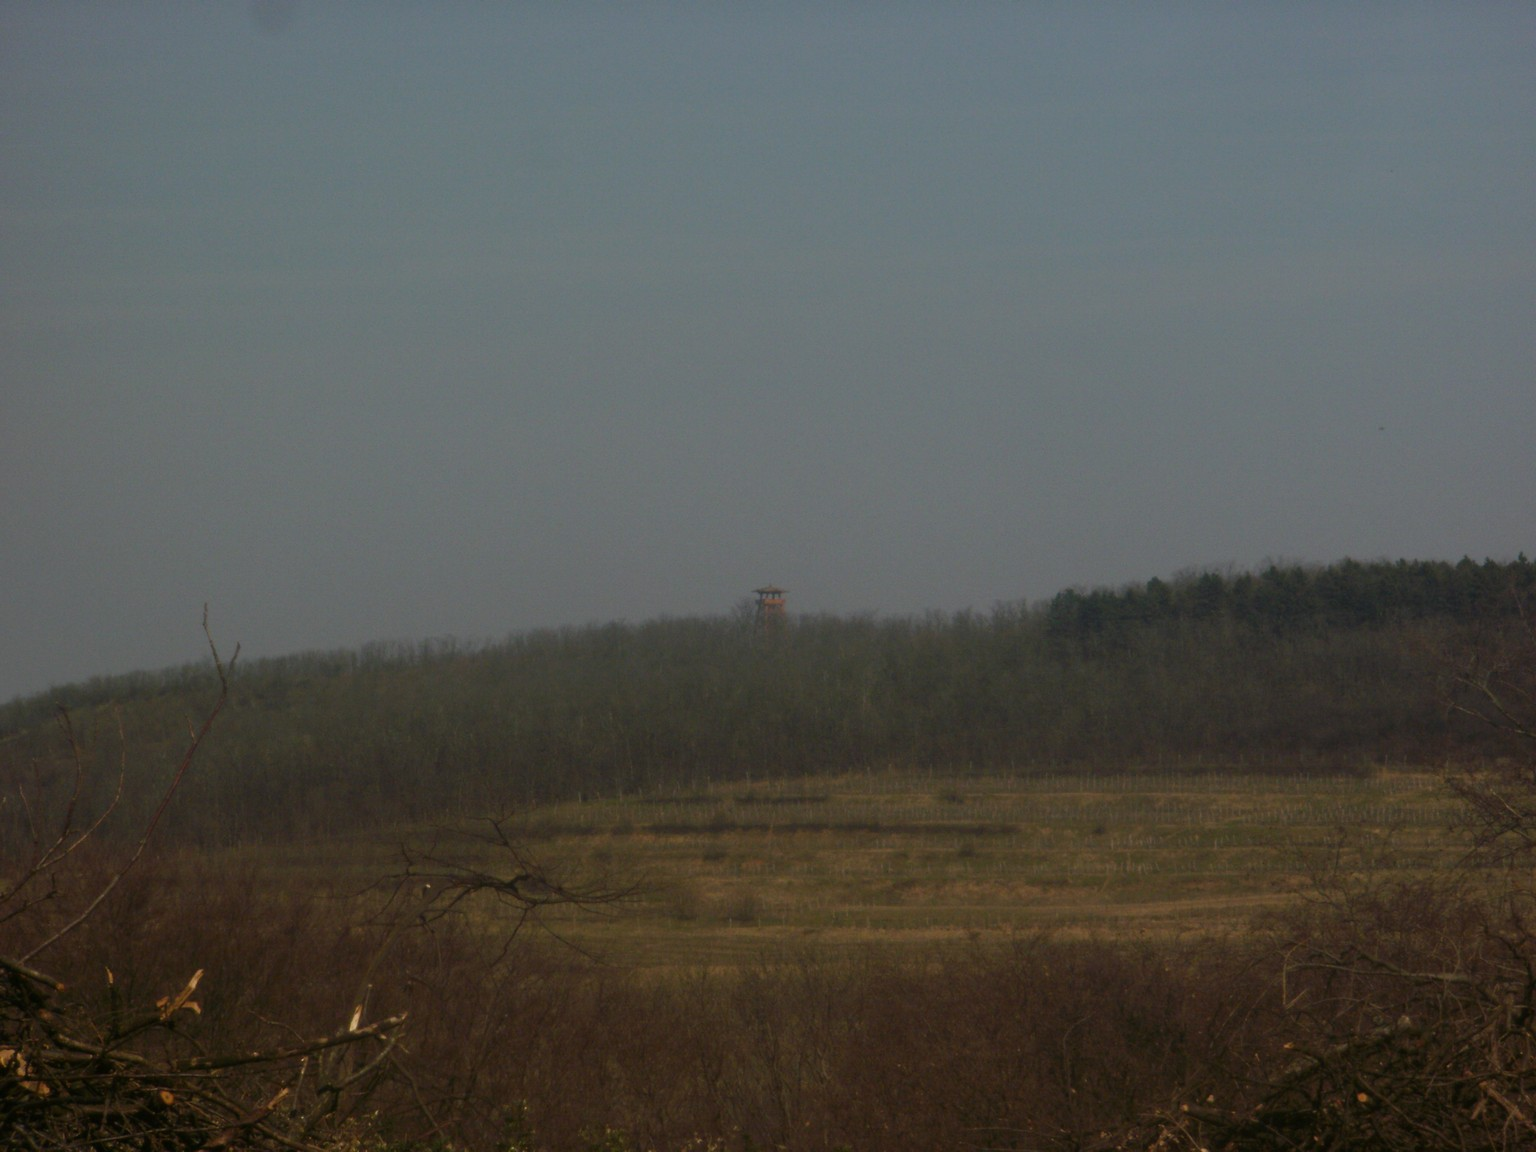 Bati kilátó (légvonalban kb. 2 km, a kék úton kb. 5 km)